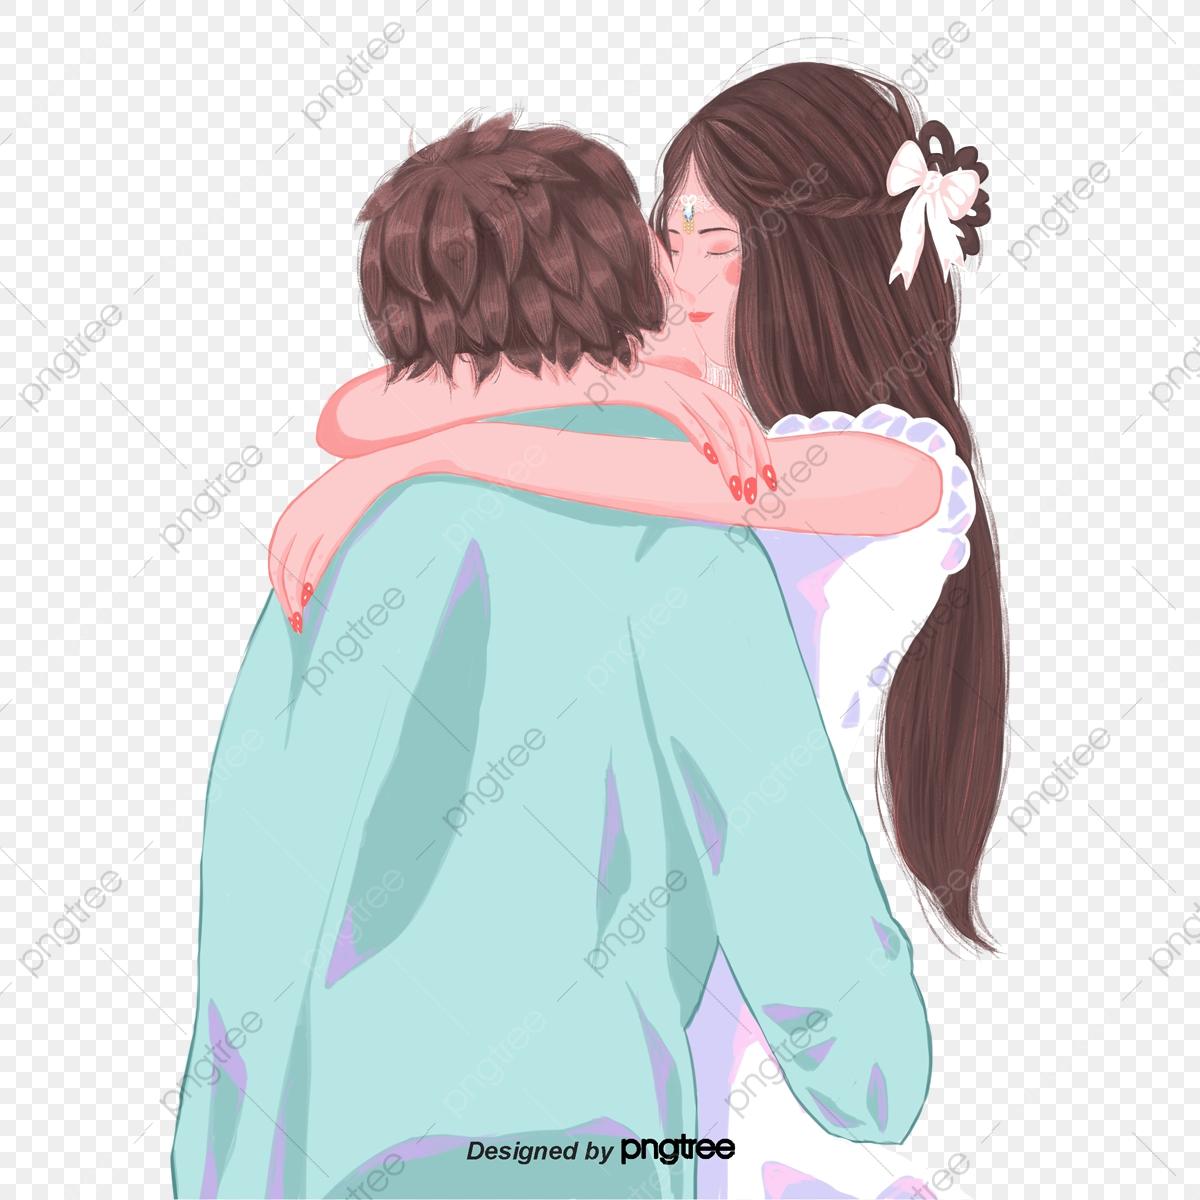 Kiss clipart sweet. A couple kissing girl